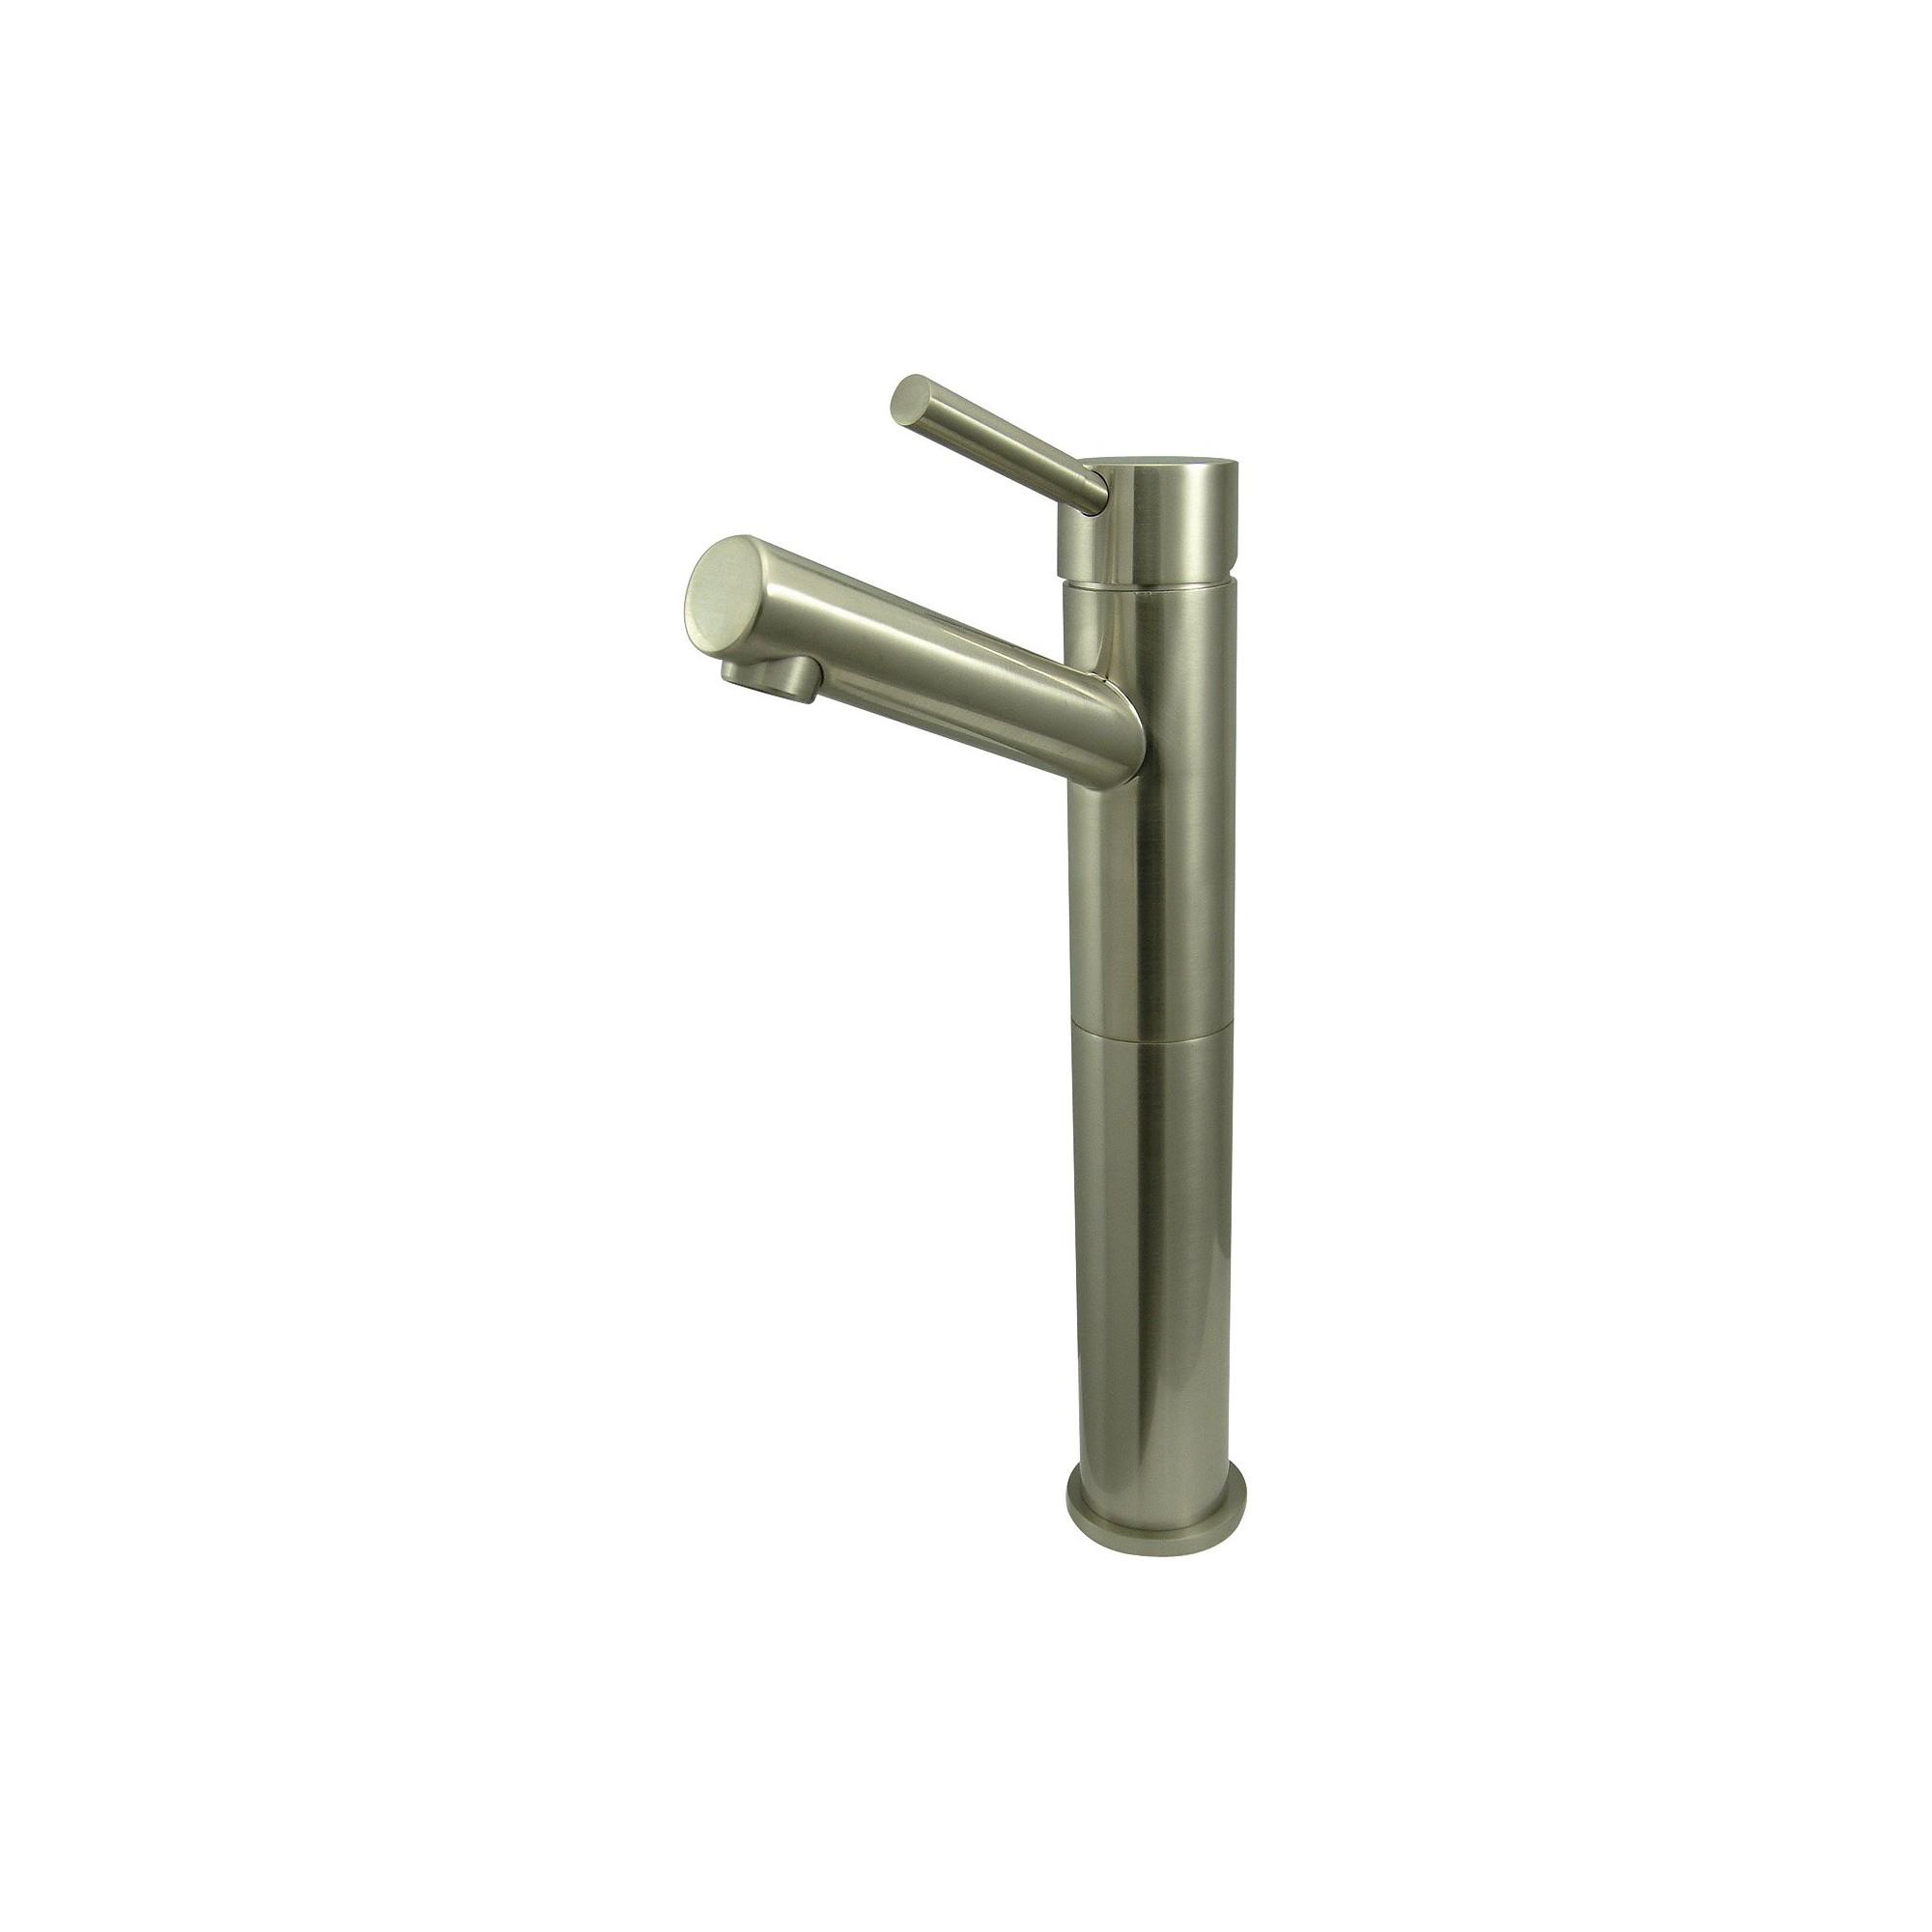 Vessel Bathroom Faucet atin Nickel - Kingston Brass, Satin Nickle